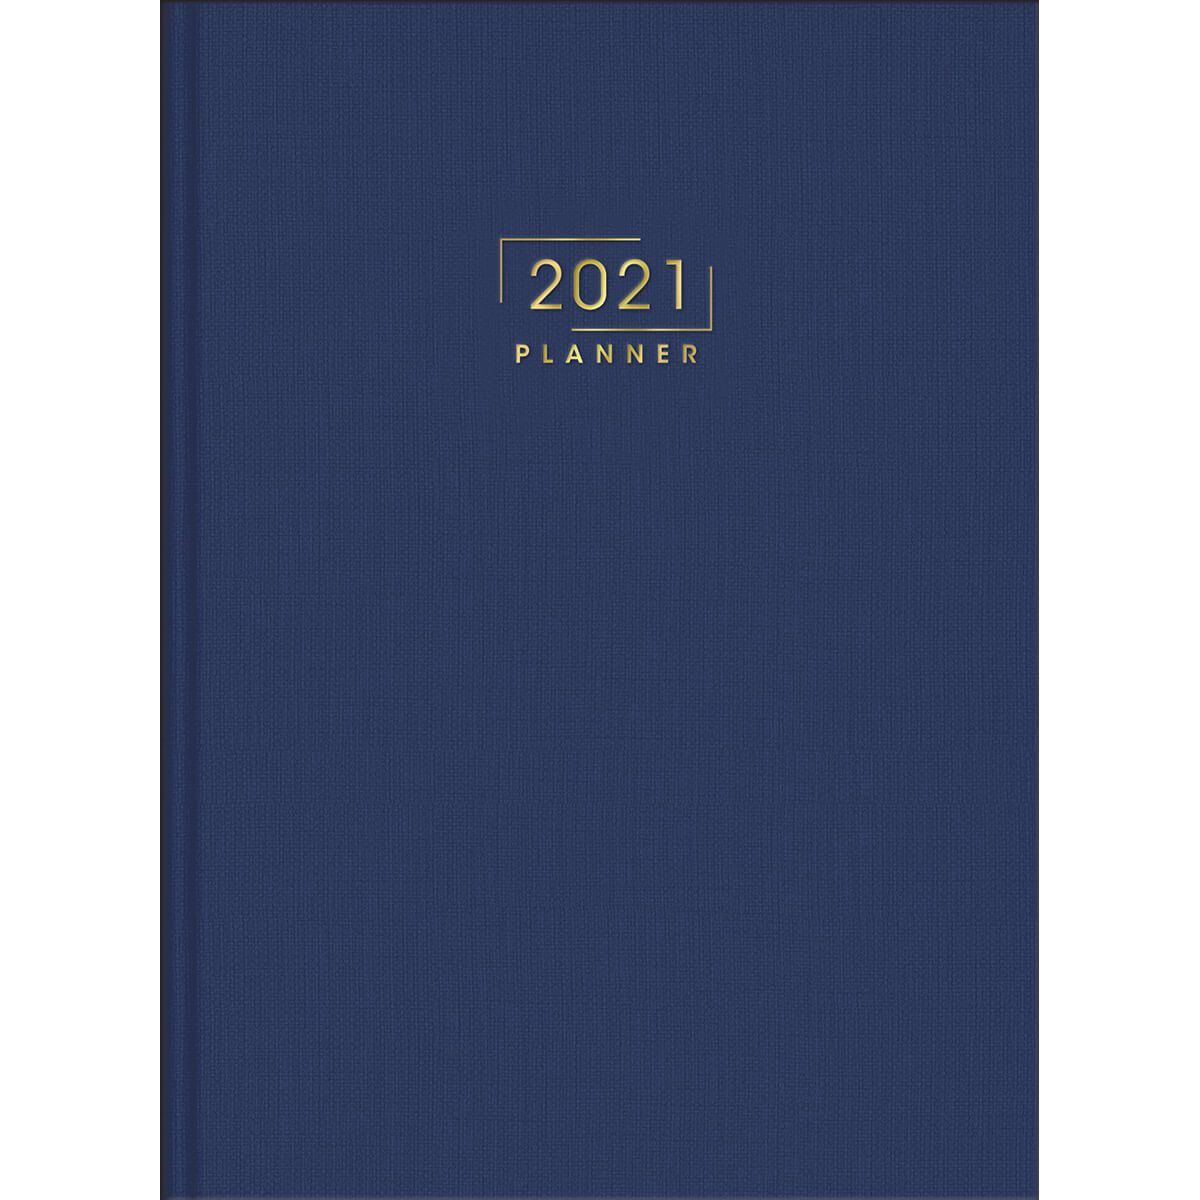 Planner semanal 2021 costurado 80 fls Lume M5 Tilibra